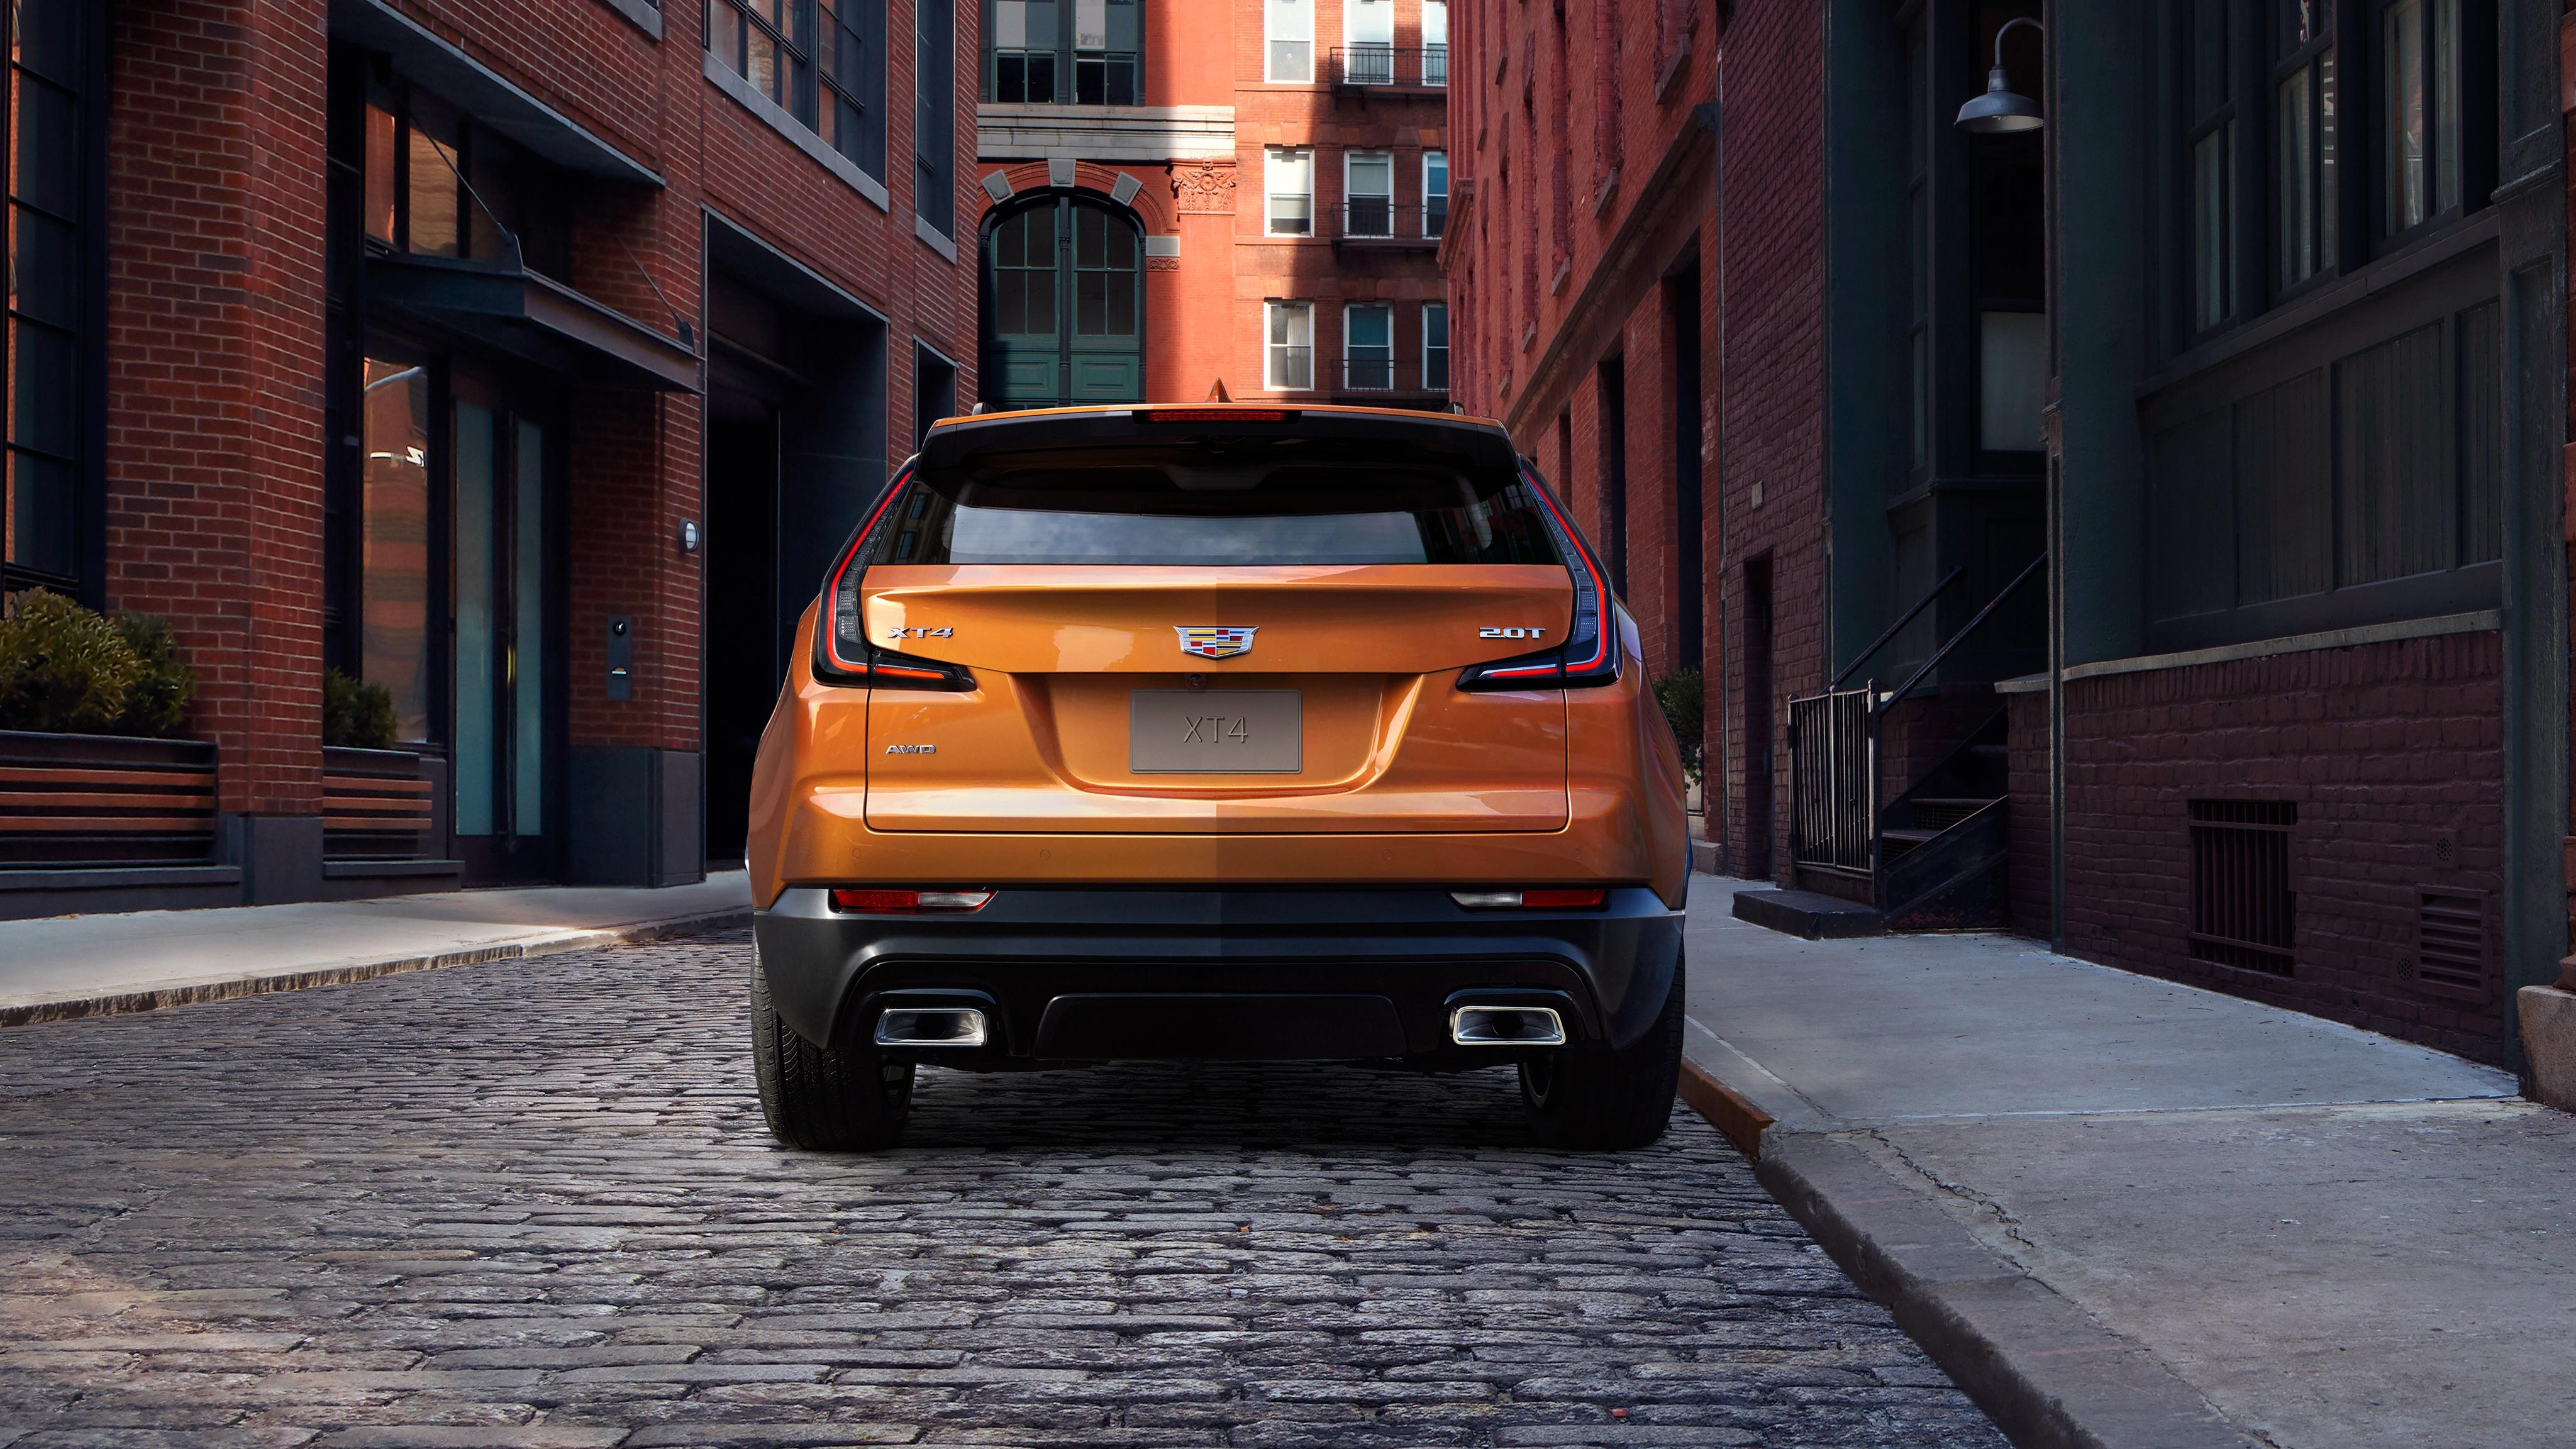 2018 Cts V >> 2019 Cadillac XT4 Sport 4K 3 Wallpaper | HD Car Wallpapers | ID #10110